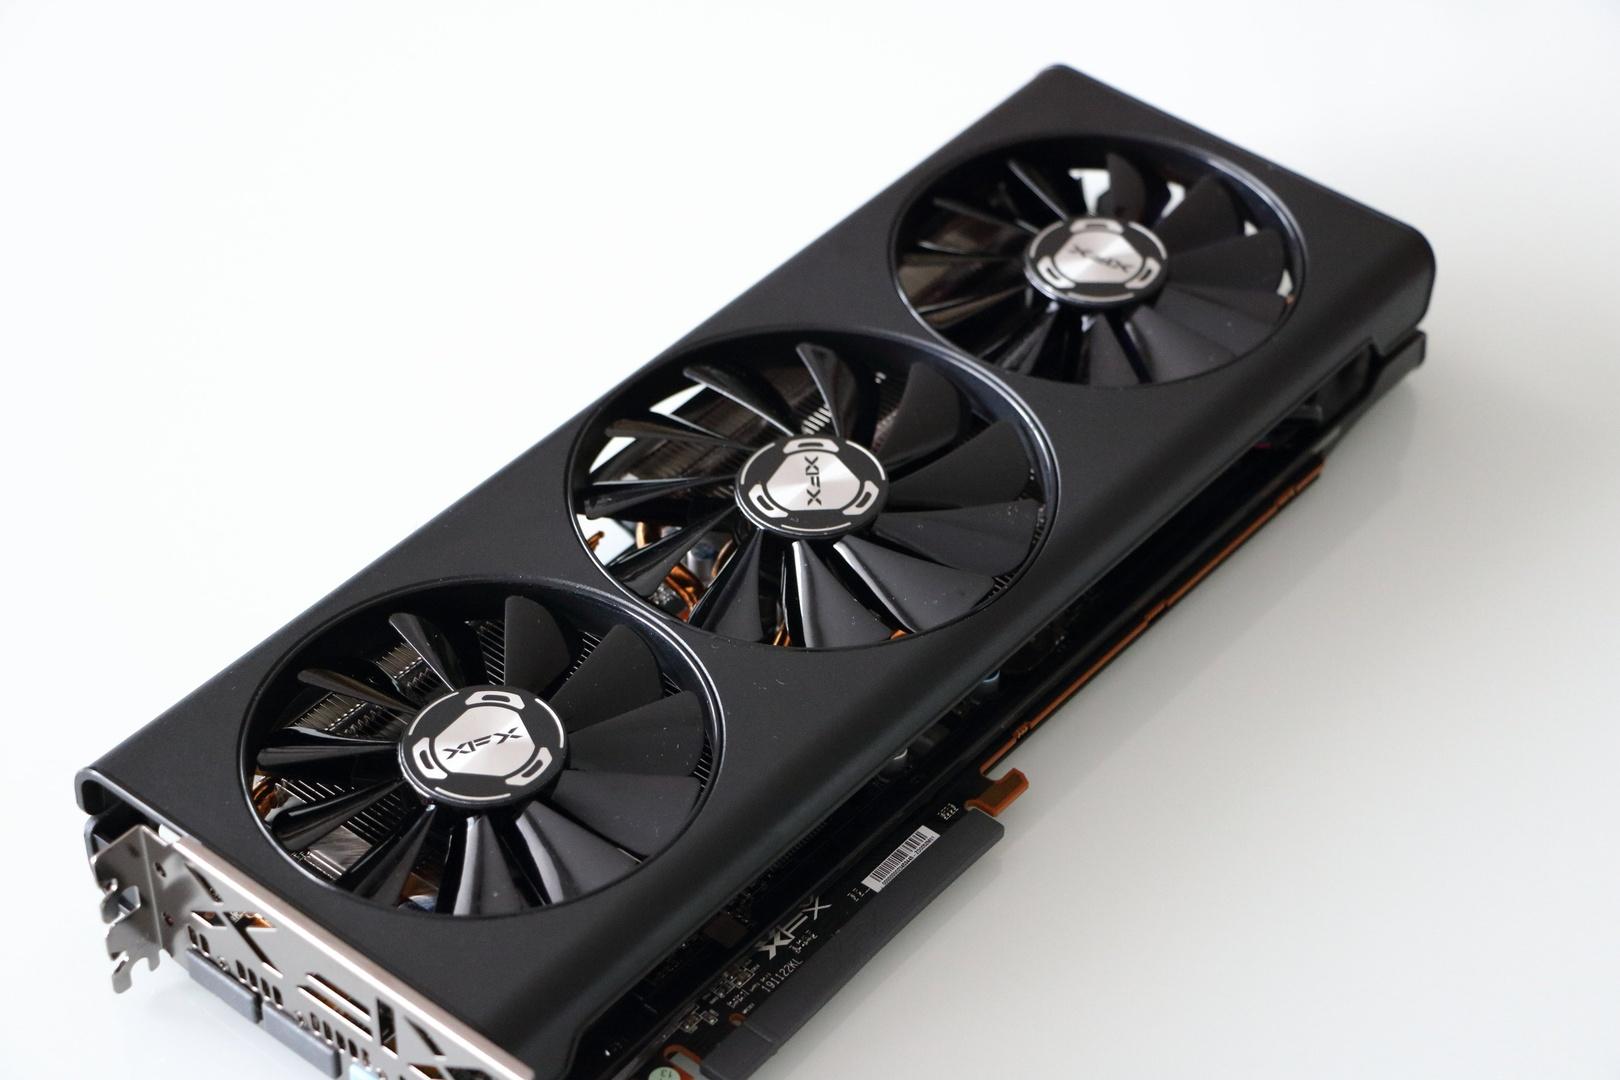 XFX Radeon RX 5700 XT Triple Dissipation